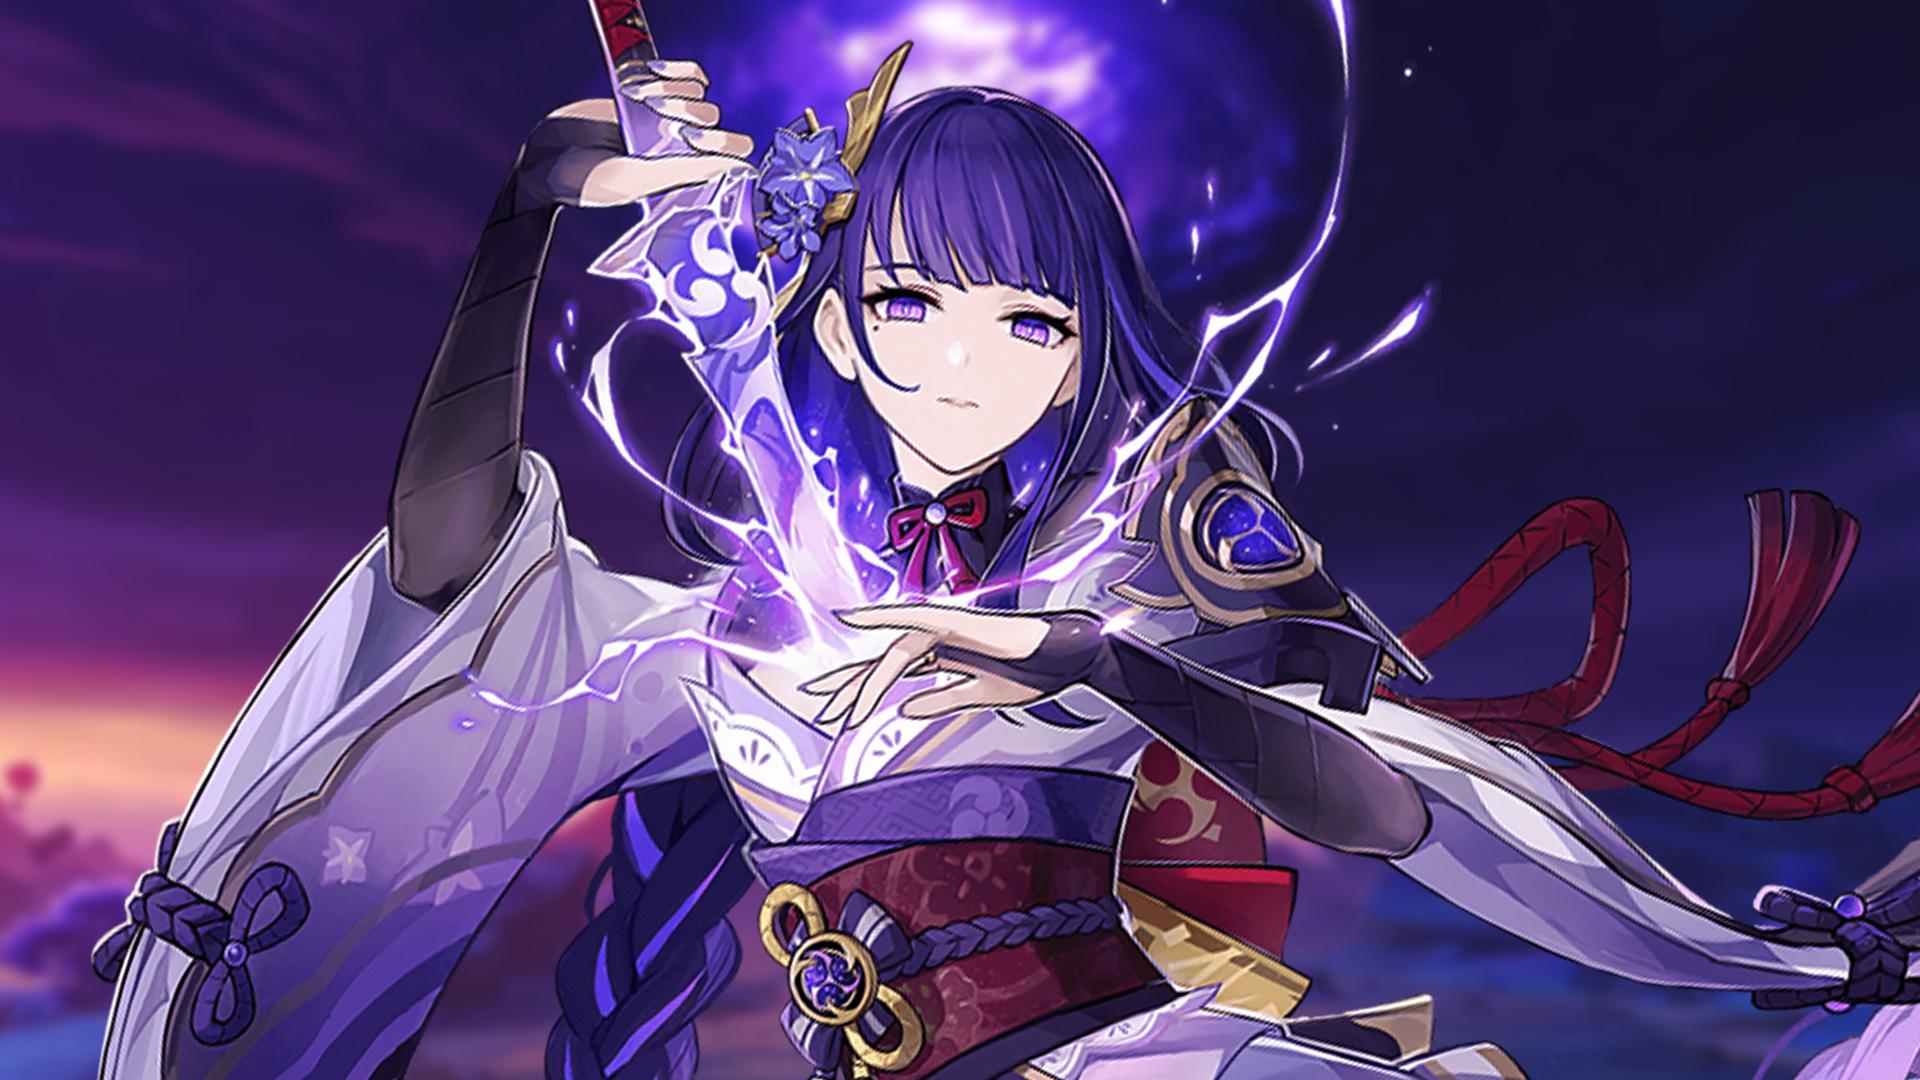 The best Genshin Impact Baal build – Raiden Shogun DPS build